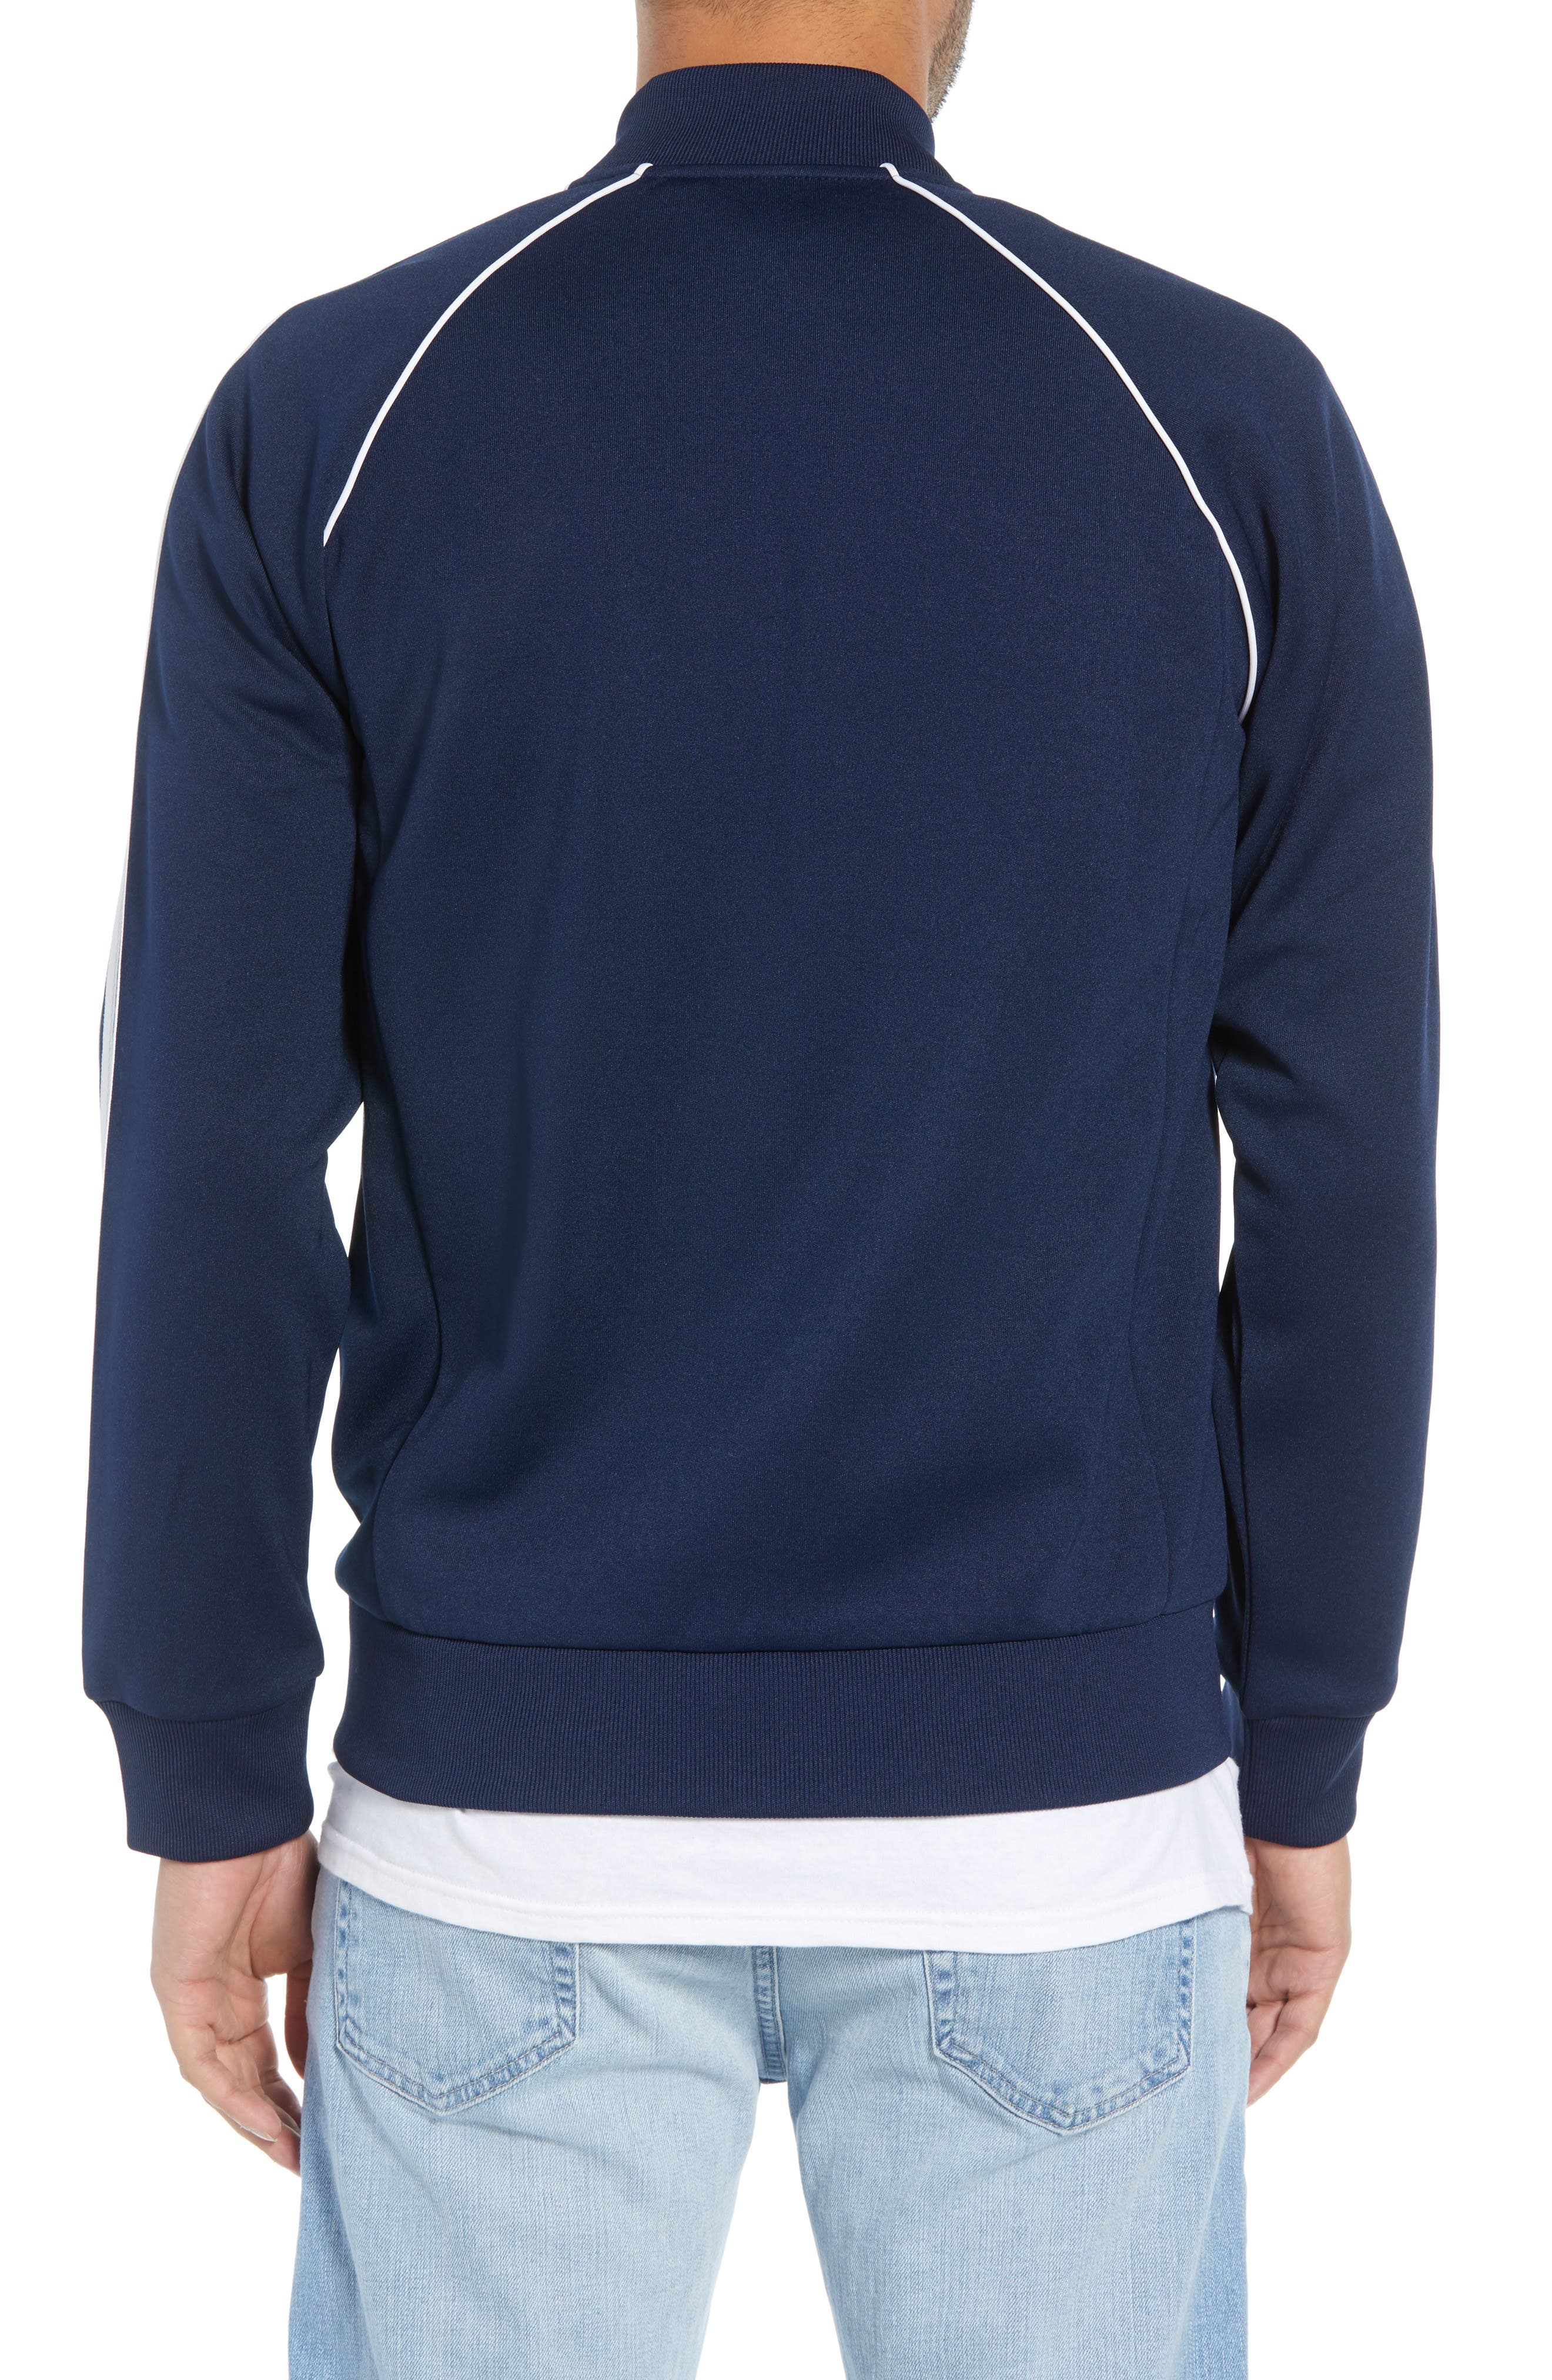 adidas SST Track Jacket,                             Alternate thumbnail 2, color,                             COLLEGIATE NAVY